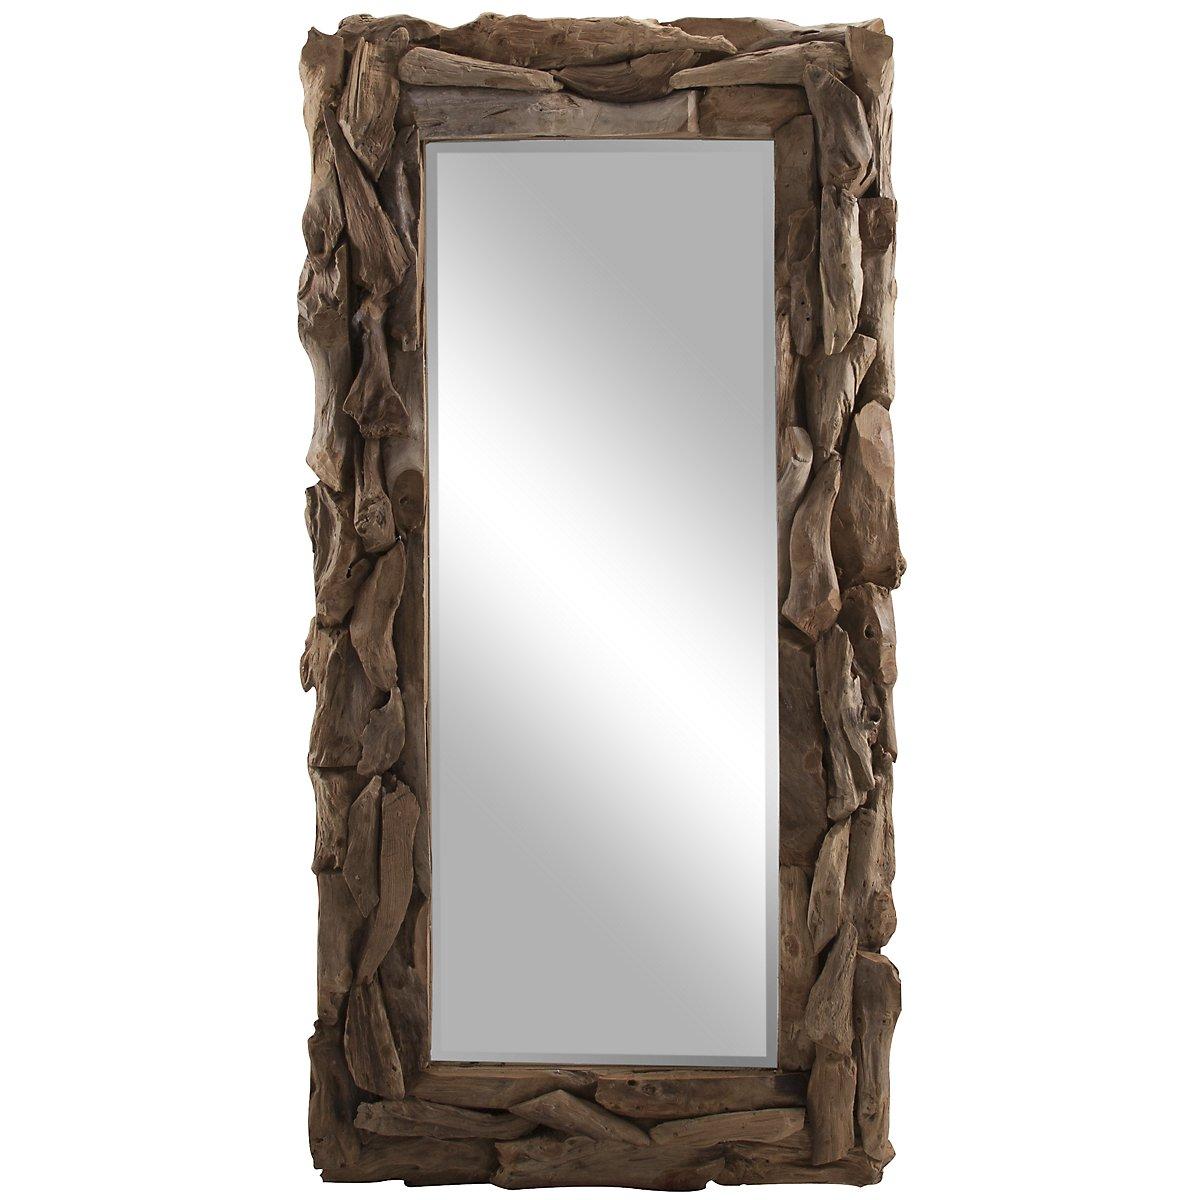 Teak Root Wood Floor Mirror